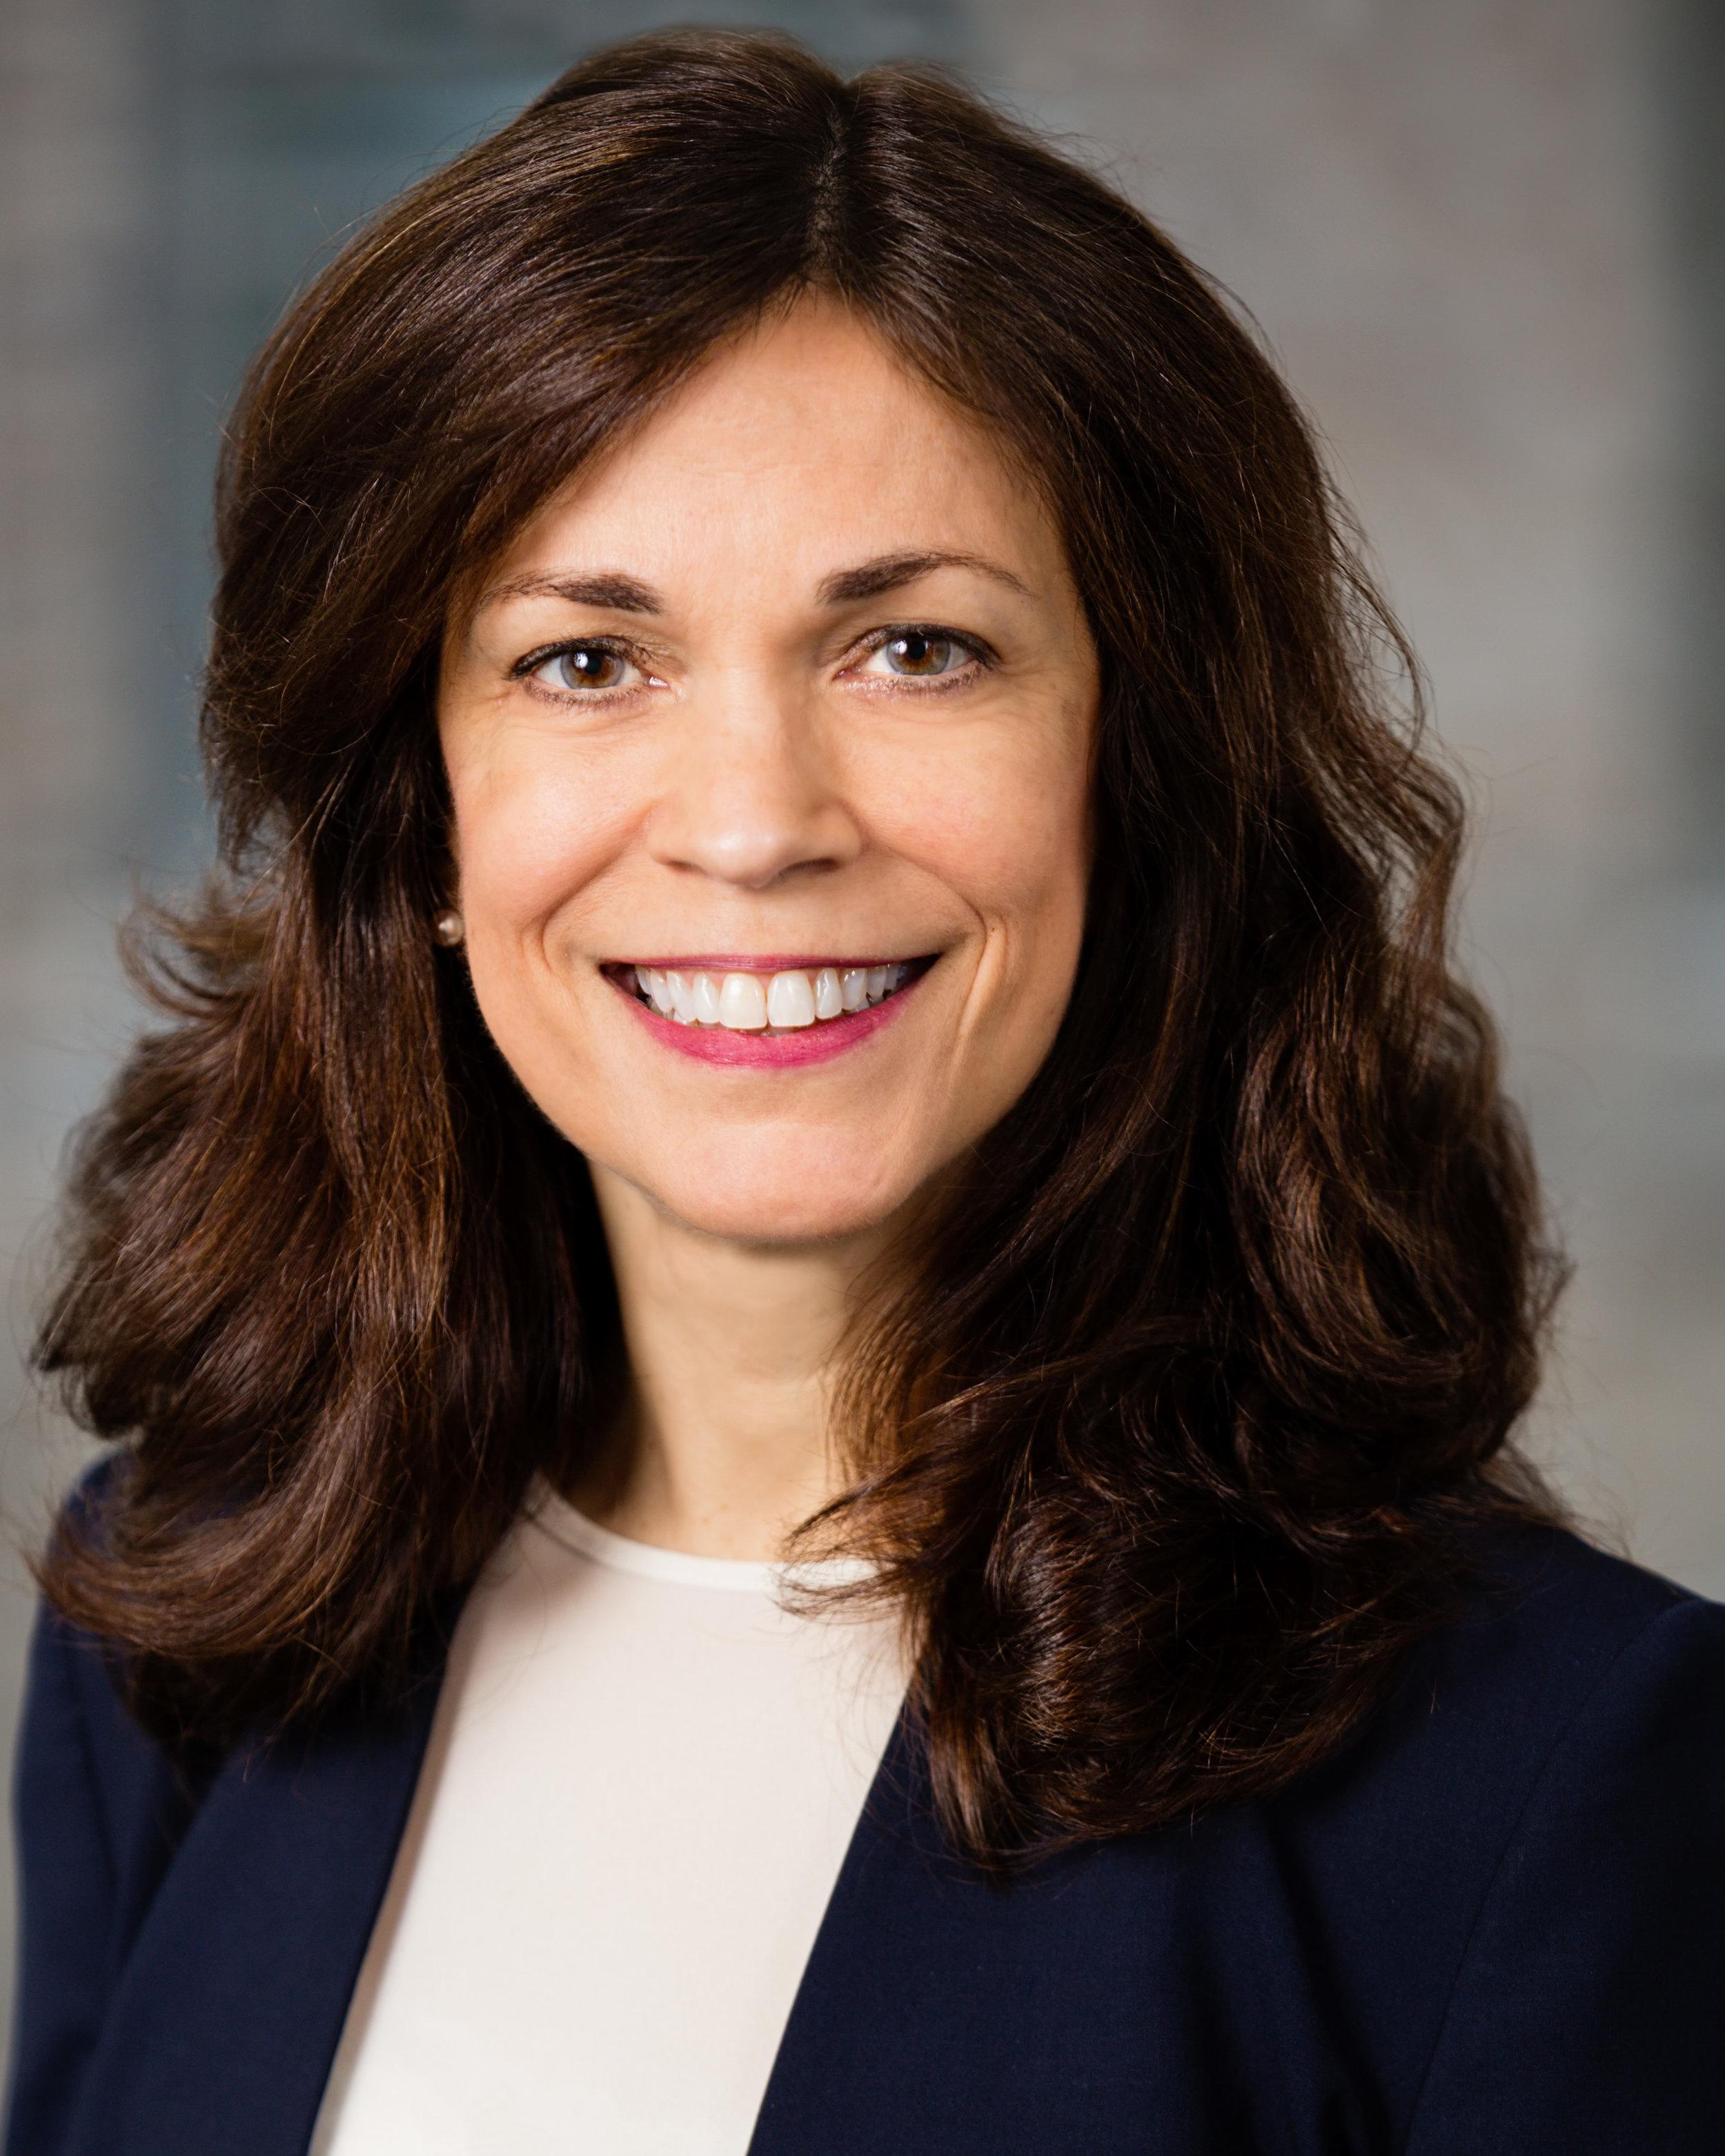 Barbara Raasch - Partner, Founding Member